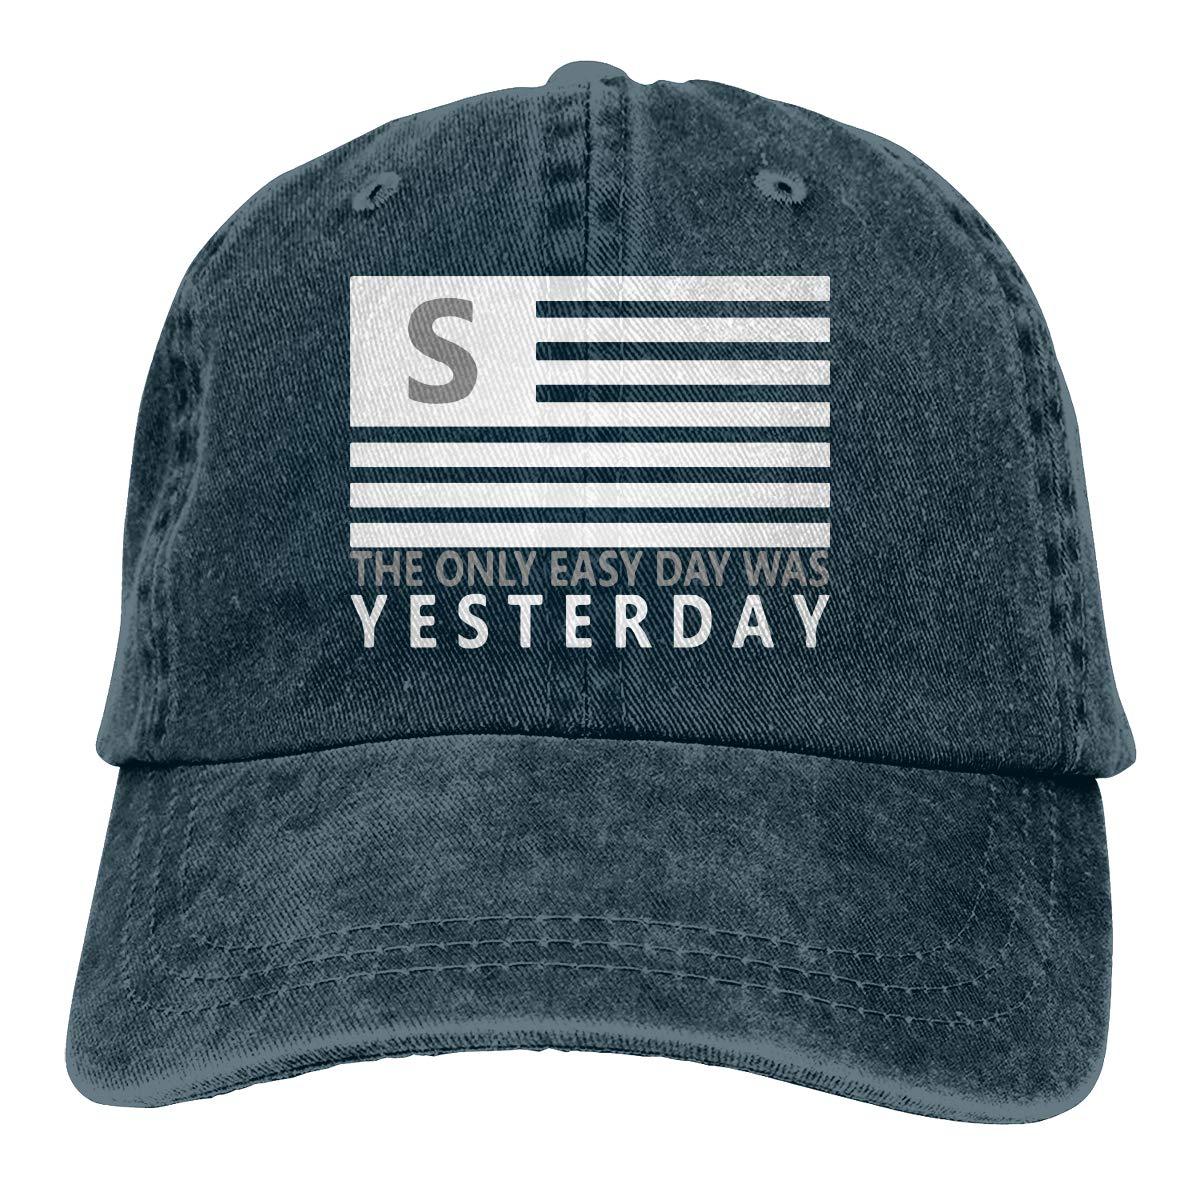 US-Navy Seals Unisex Personalize Jeans Hip Hop Cap Adjustable Baseball Cap